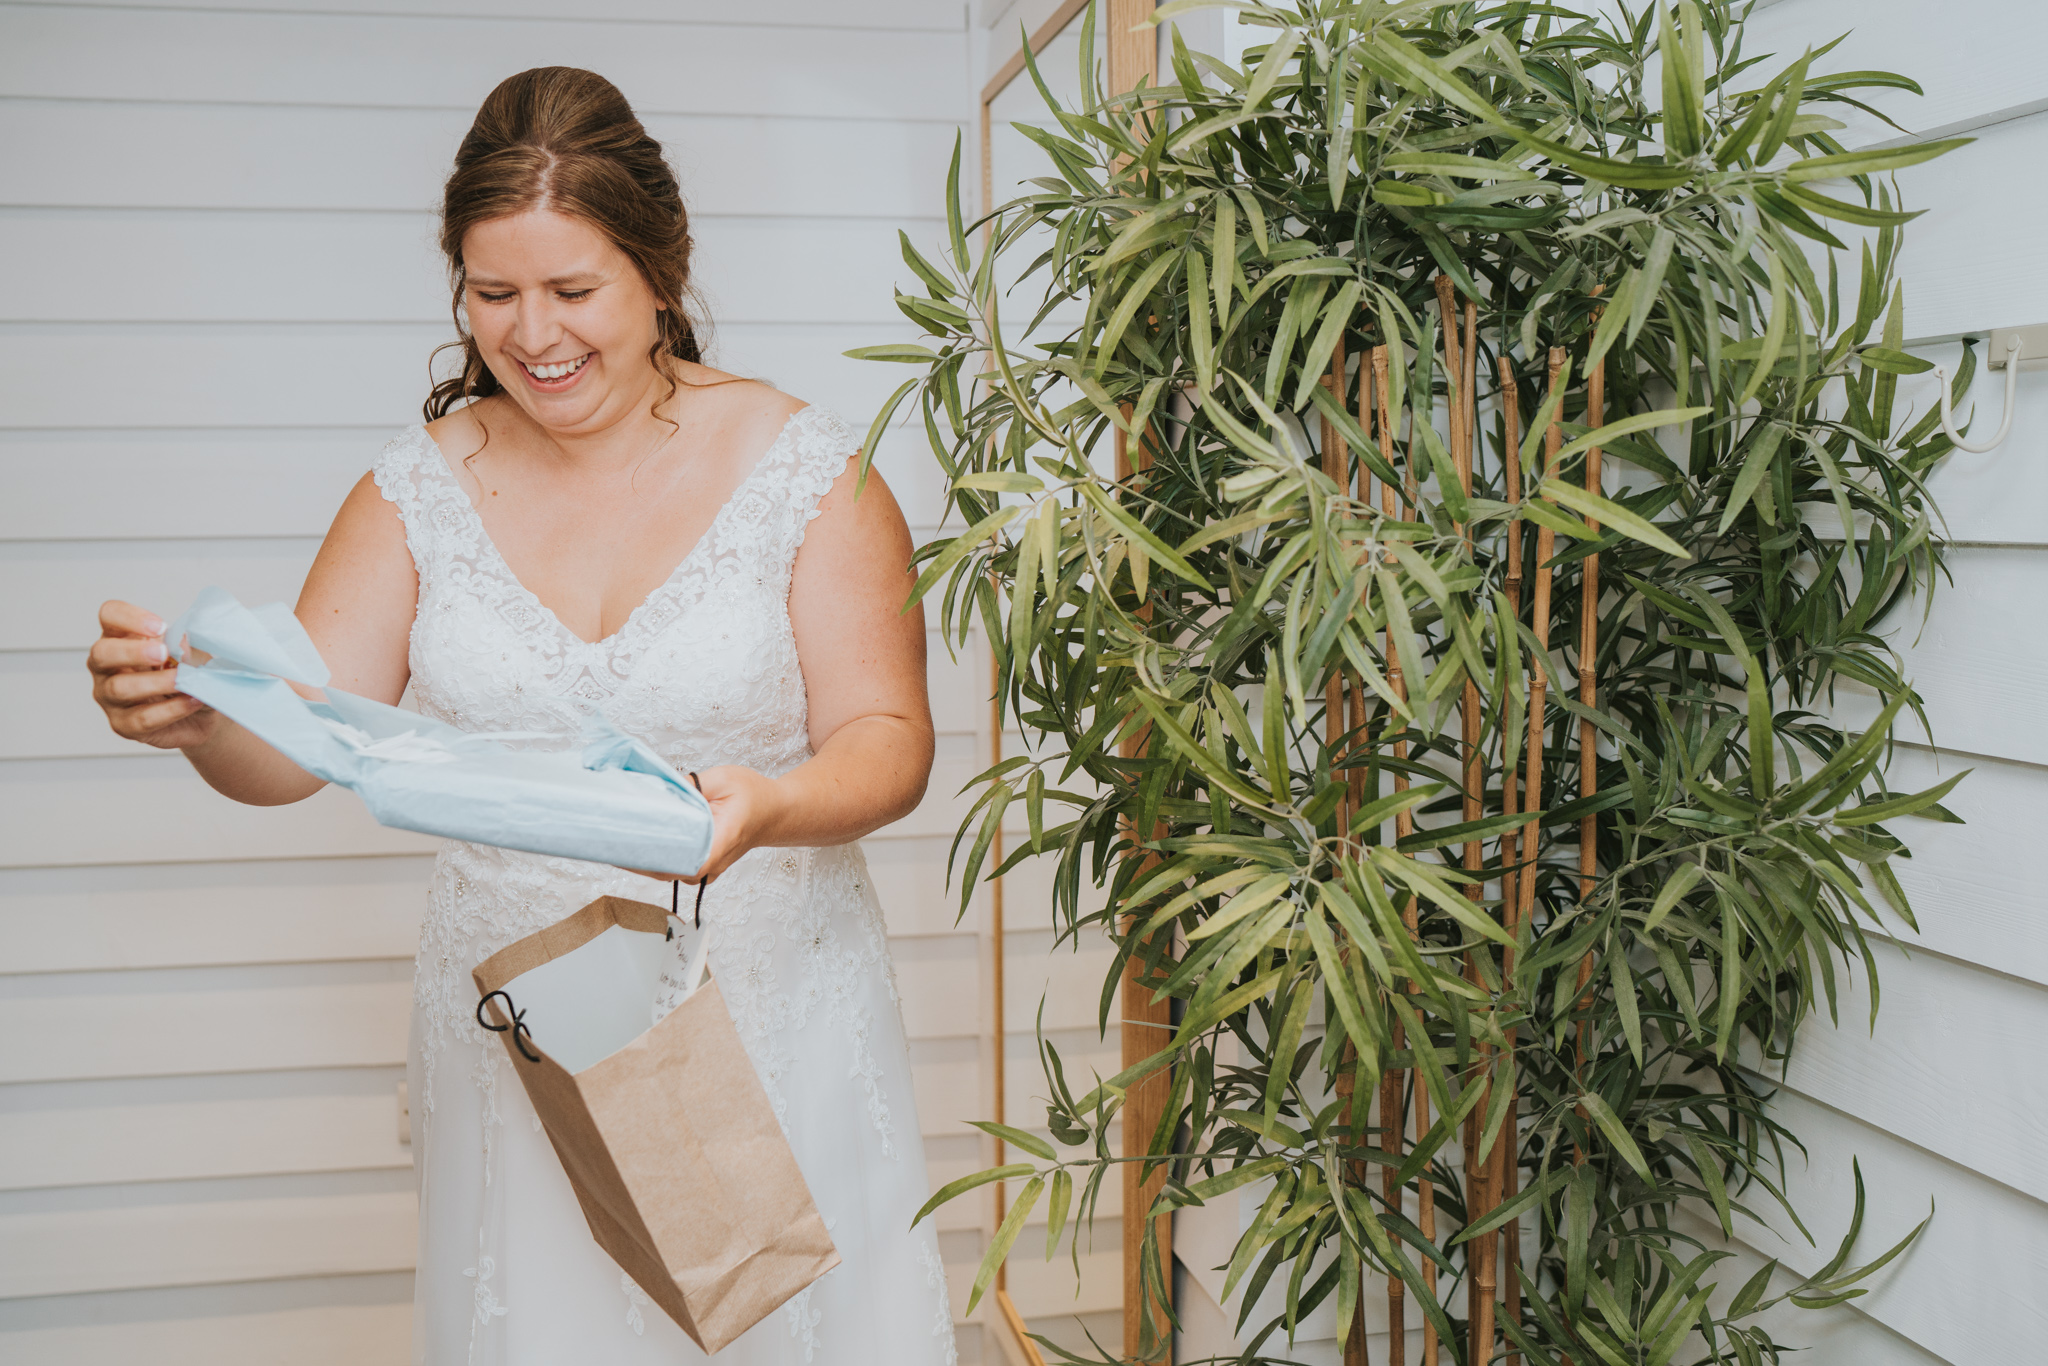 john-amy-relaxed-beach-wedding-tunnels-beaches-ilfracombe-north-devon-grace-elizabeth-colchester-essex-alternative-relaxed-wedding-photography-devon-suffolk-norfolk-essex (37 of 159).jpg